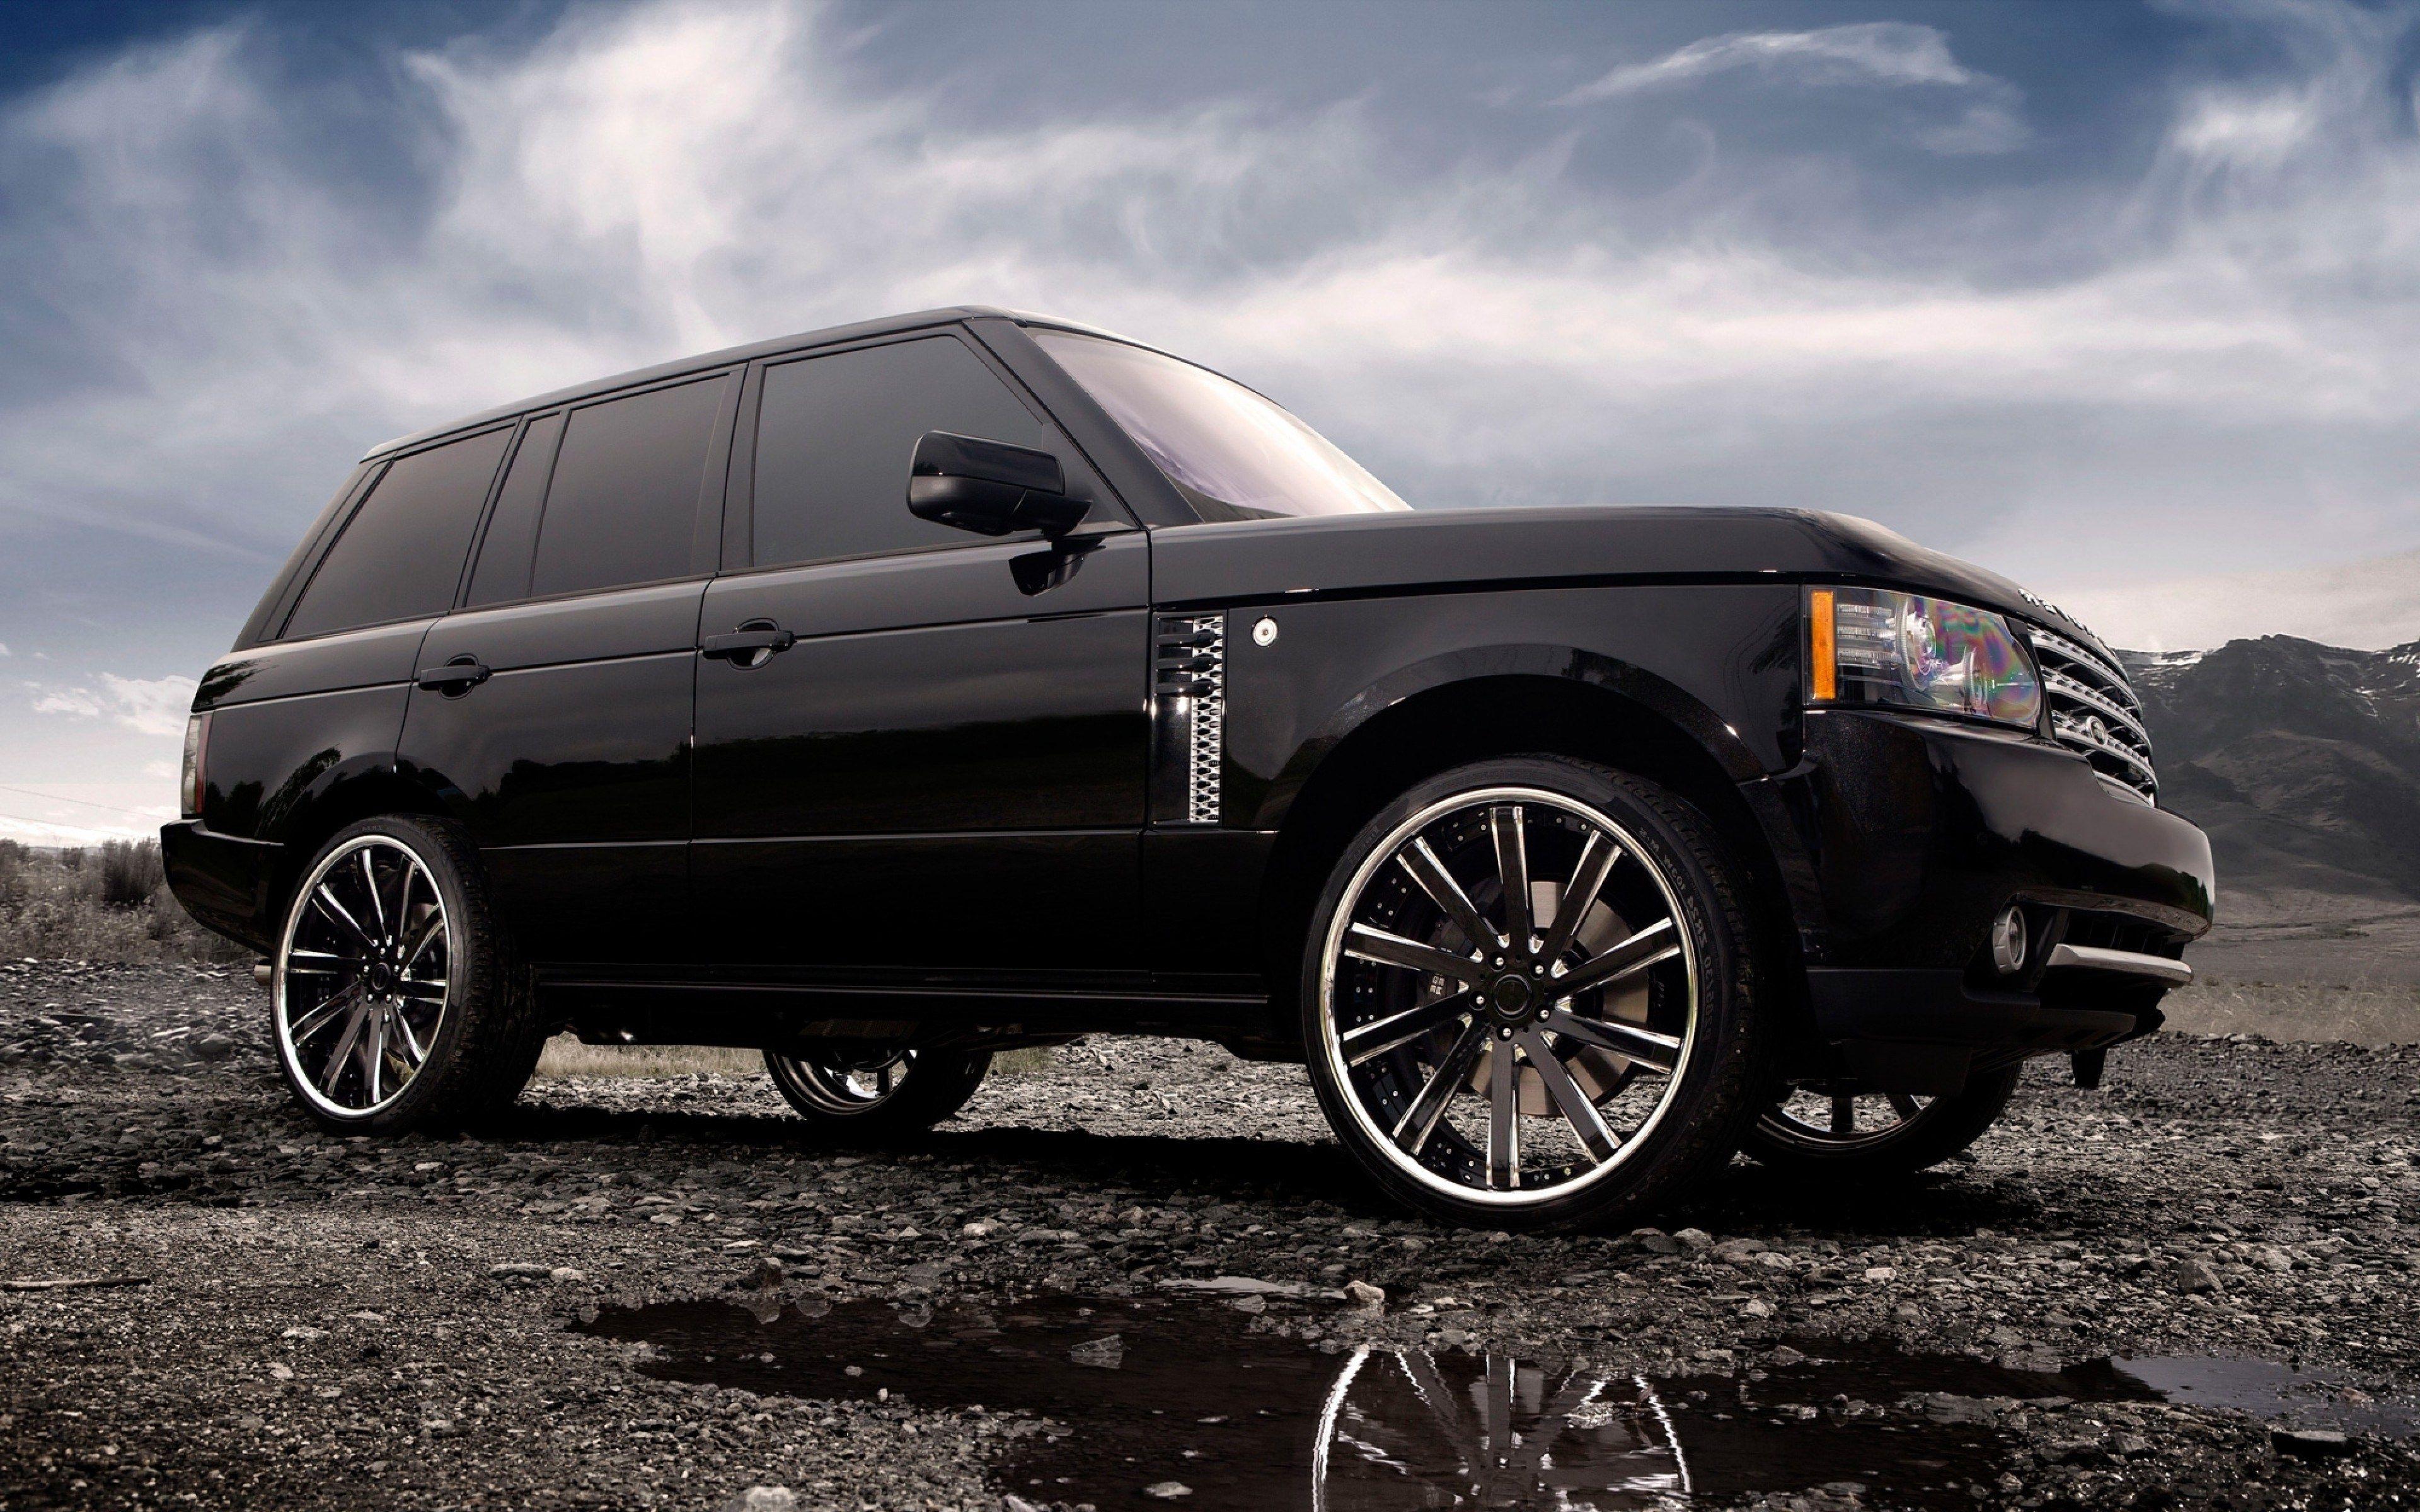 3840x2400 Range Rover 4k Background Image Hd Range Rover Black Range Rover Black Range